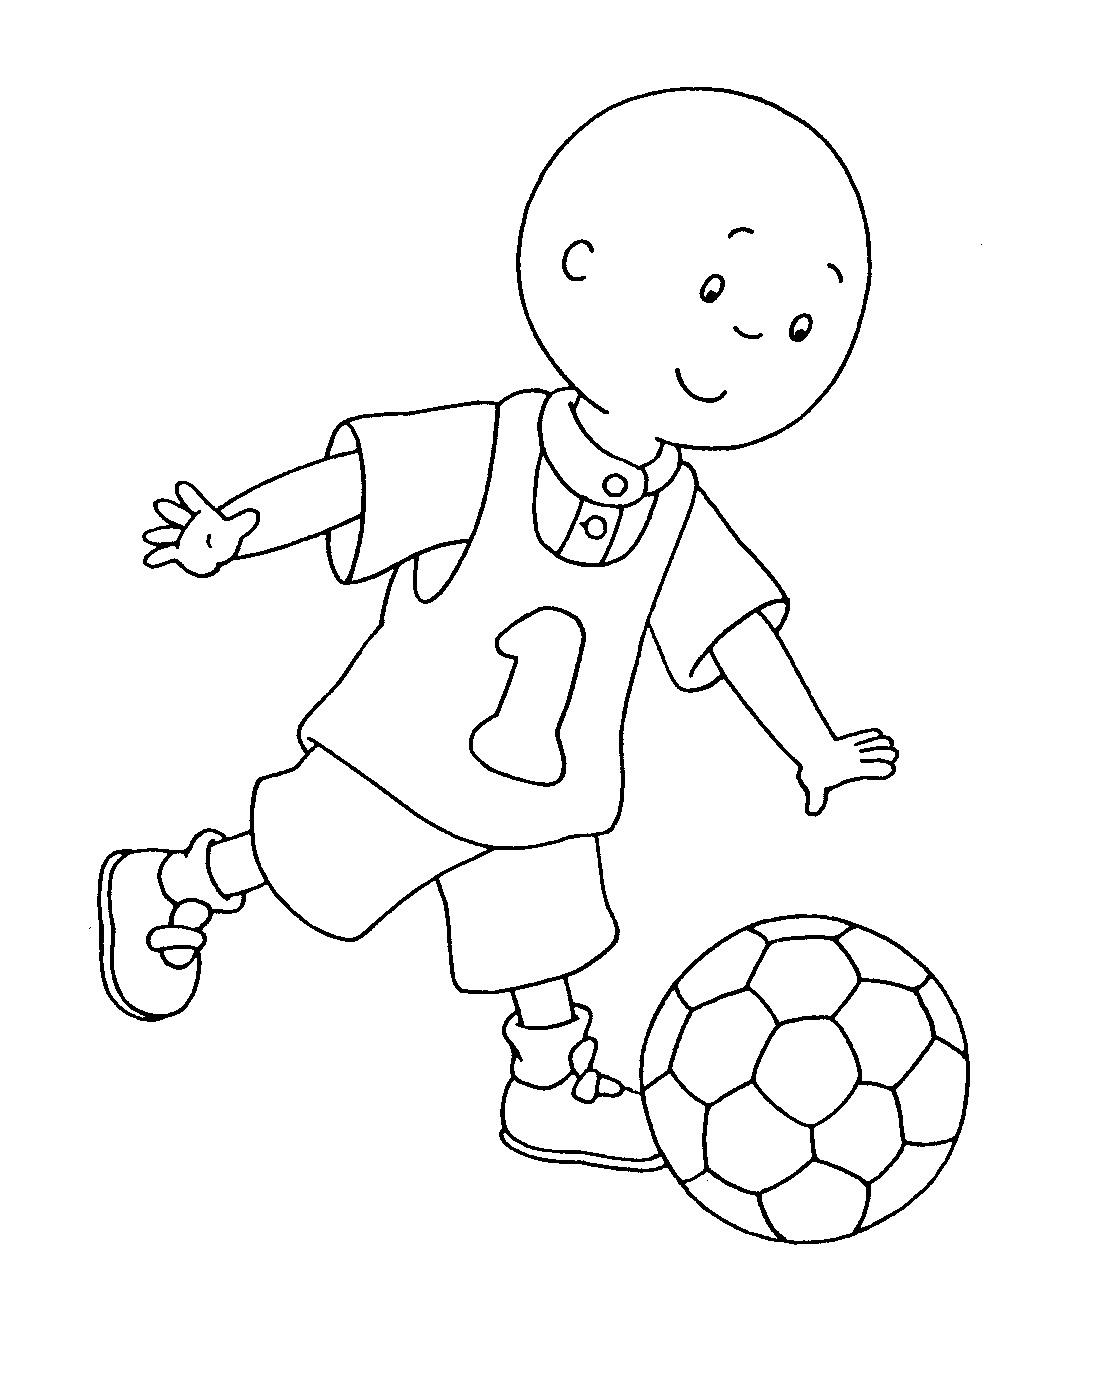 115 dibujos de Caillou para colorear | Oh Kids | Page 11